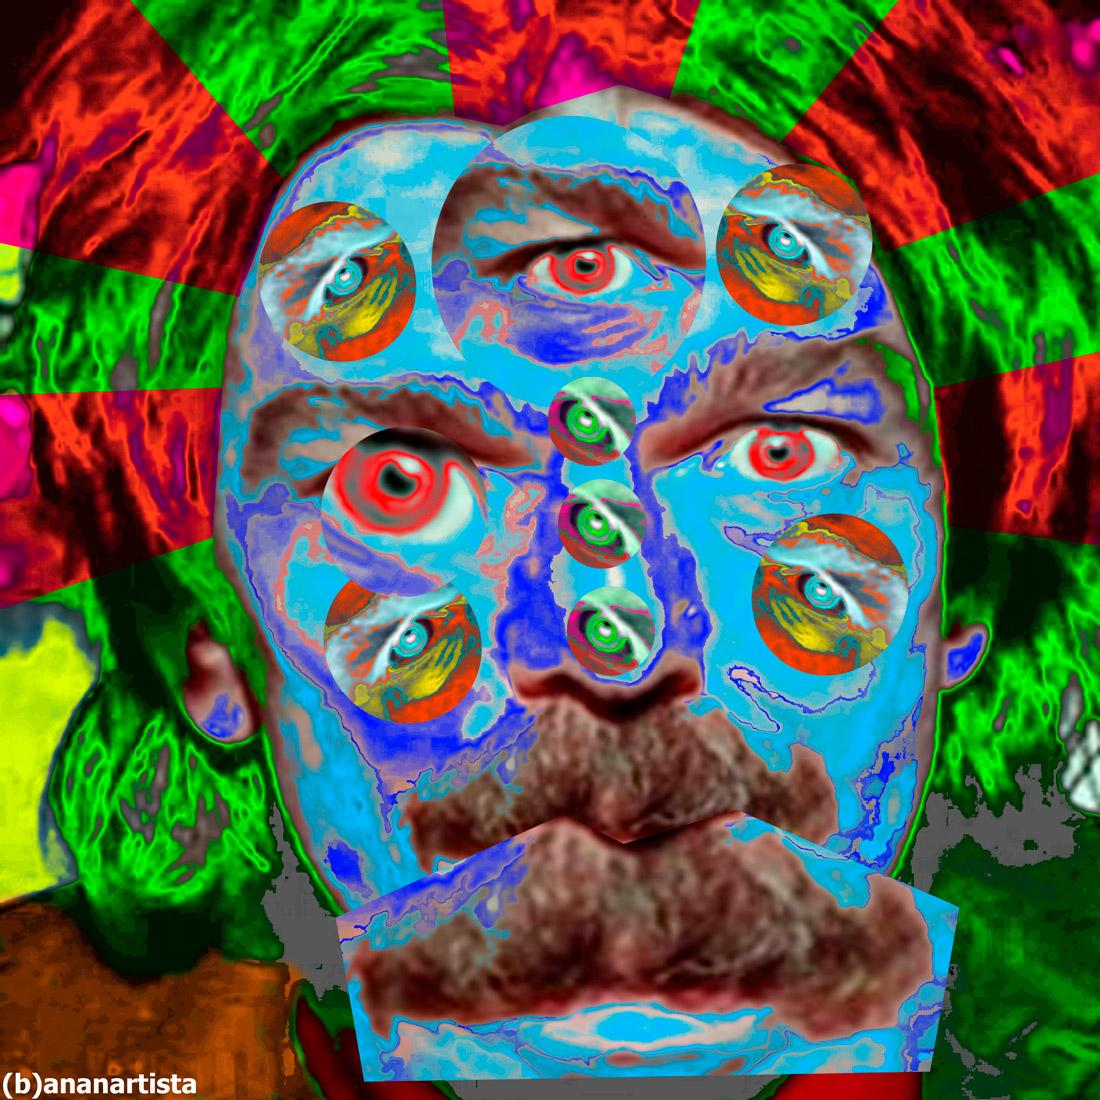 captain beefheart magic mustache babouche - digital collage pop portrait by (b)ananartista sbuff